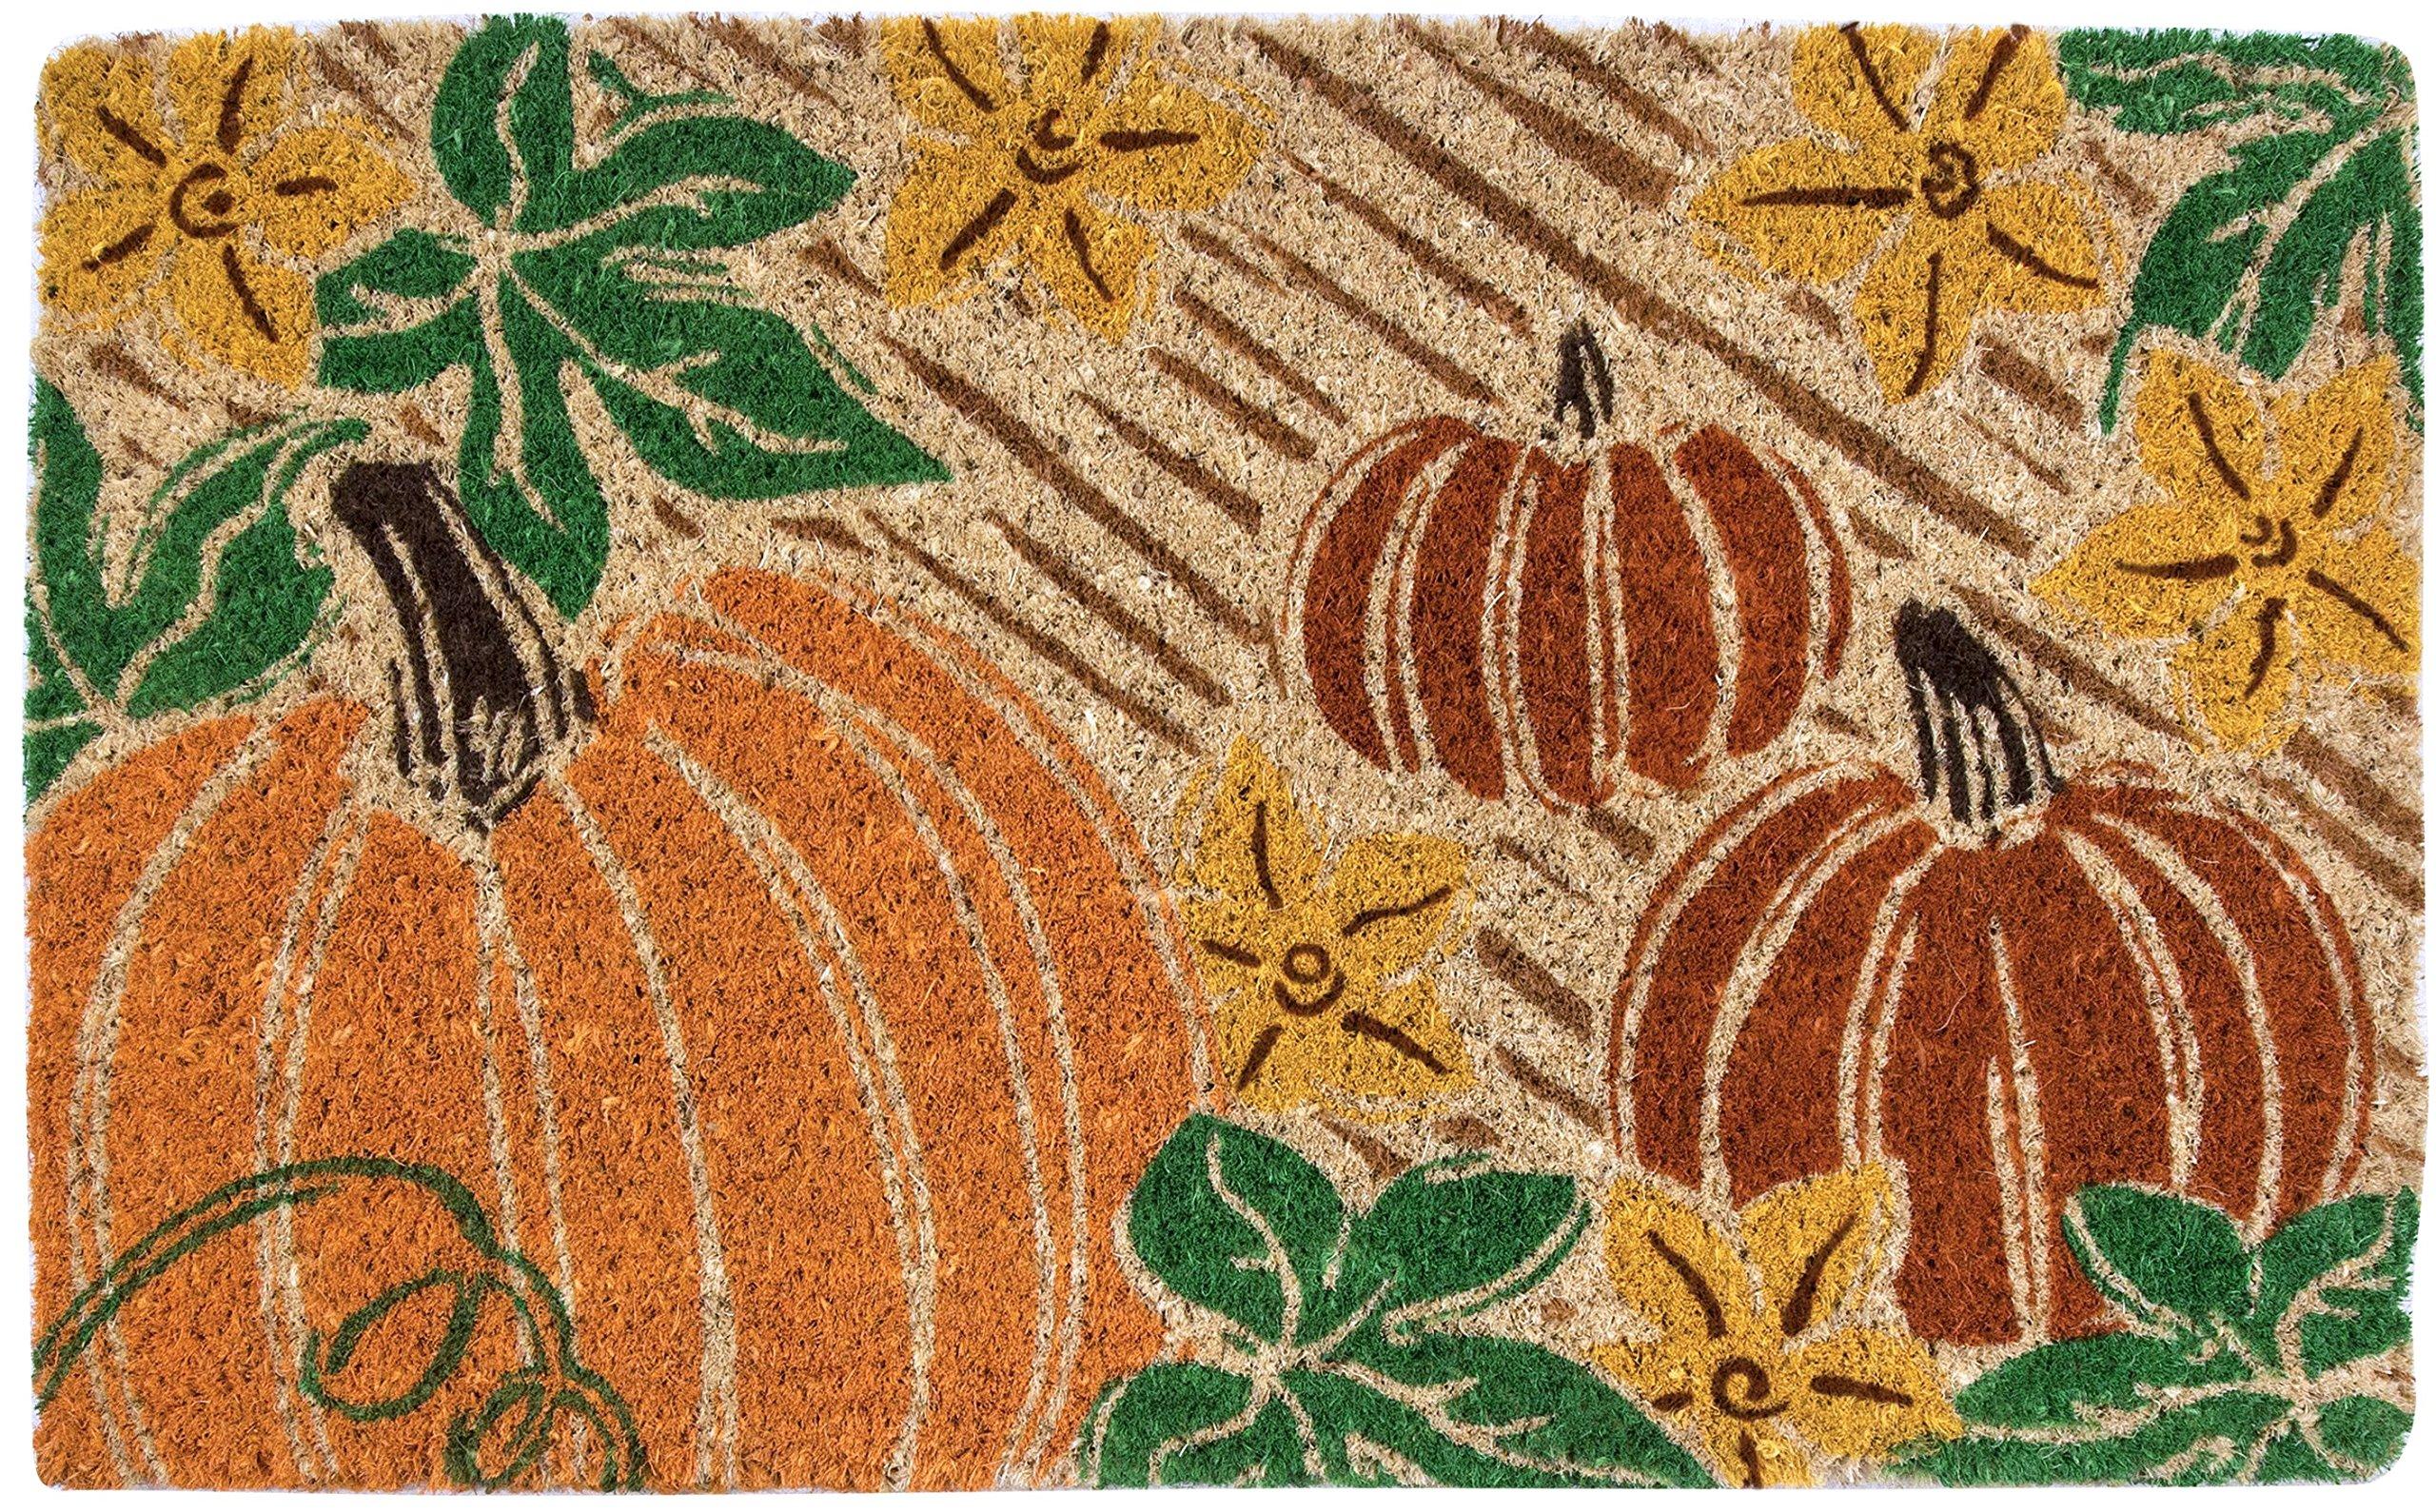 Entryways Pumpkin Patch, Hand-Stenciled, All-Natural Coconut Fiber Coir Doormat 18'' X 30'' x .75''